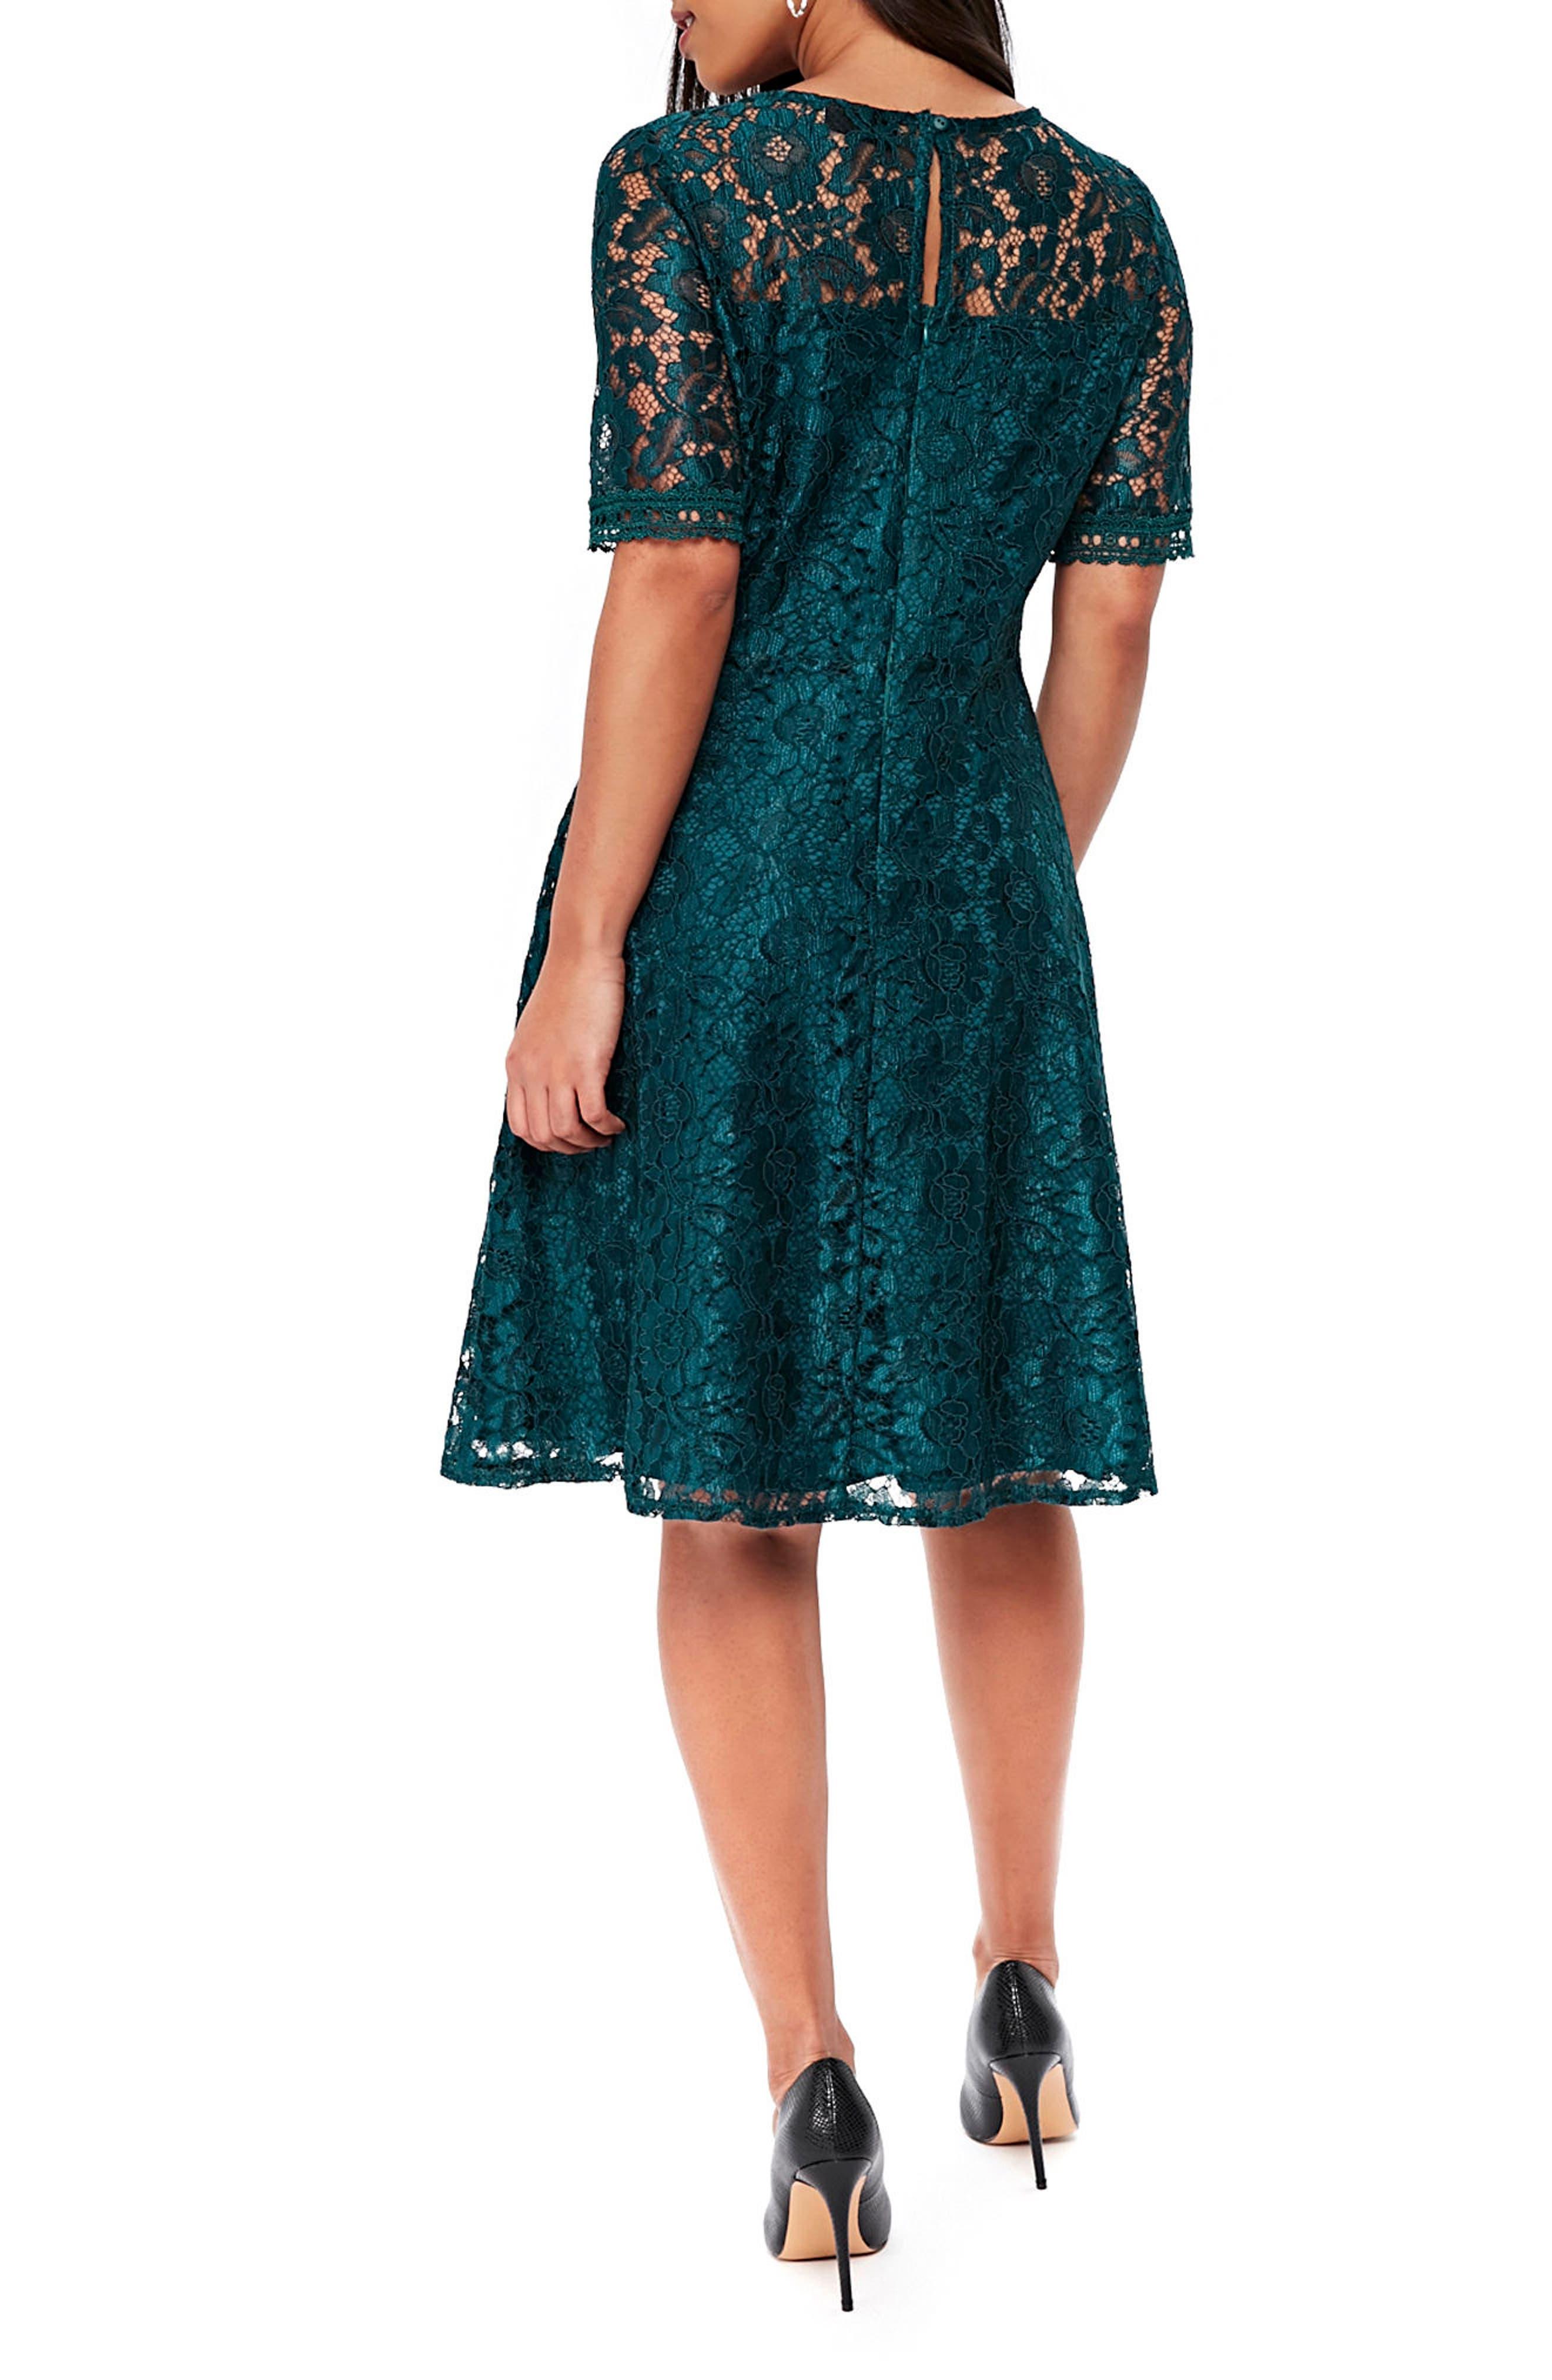 Lace & Lattice Fit & Flare Dress,                             Alternate thumbnail 2, color,                             Teal